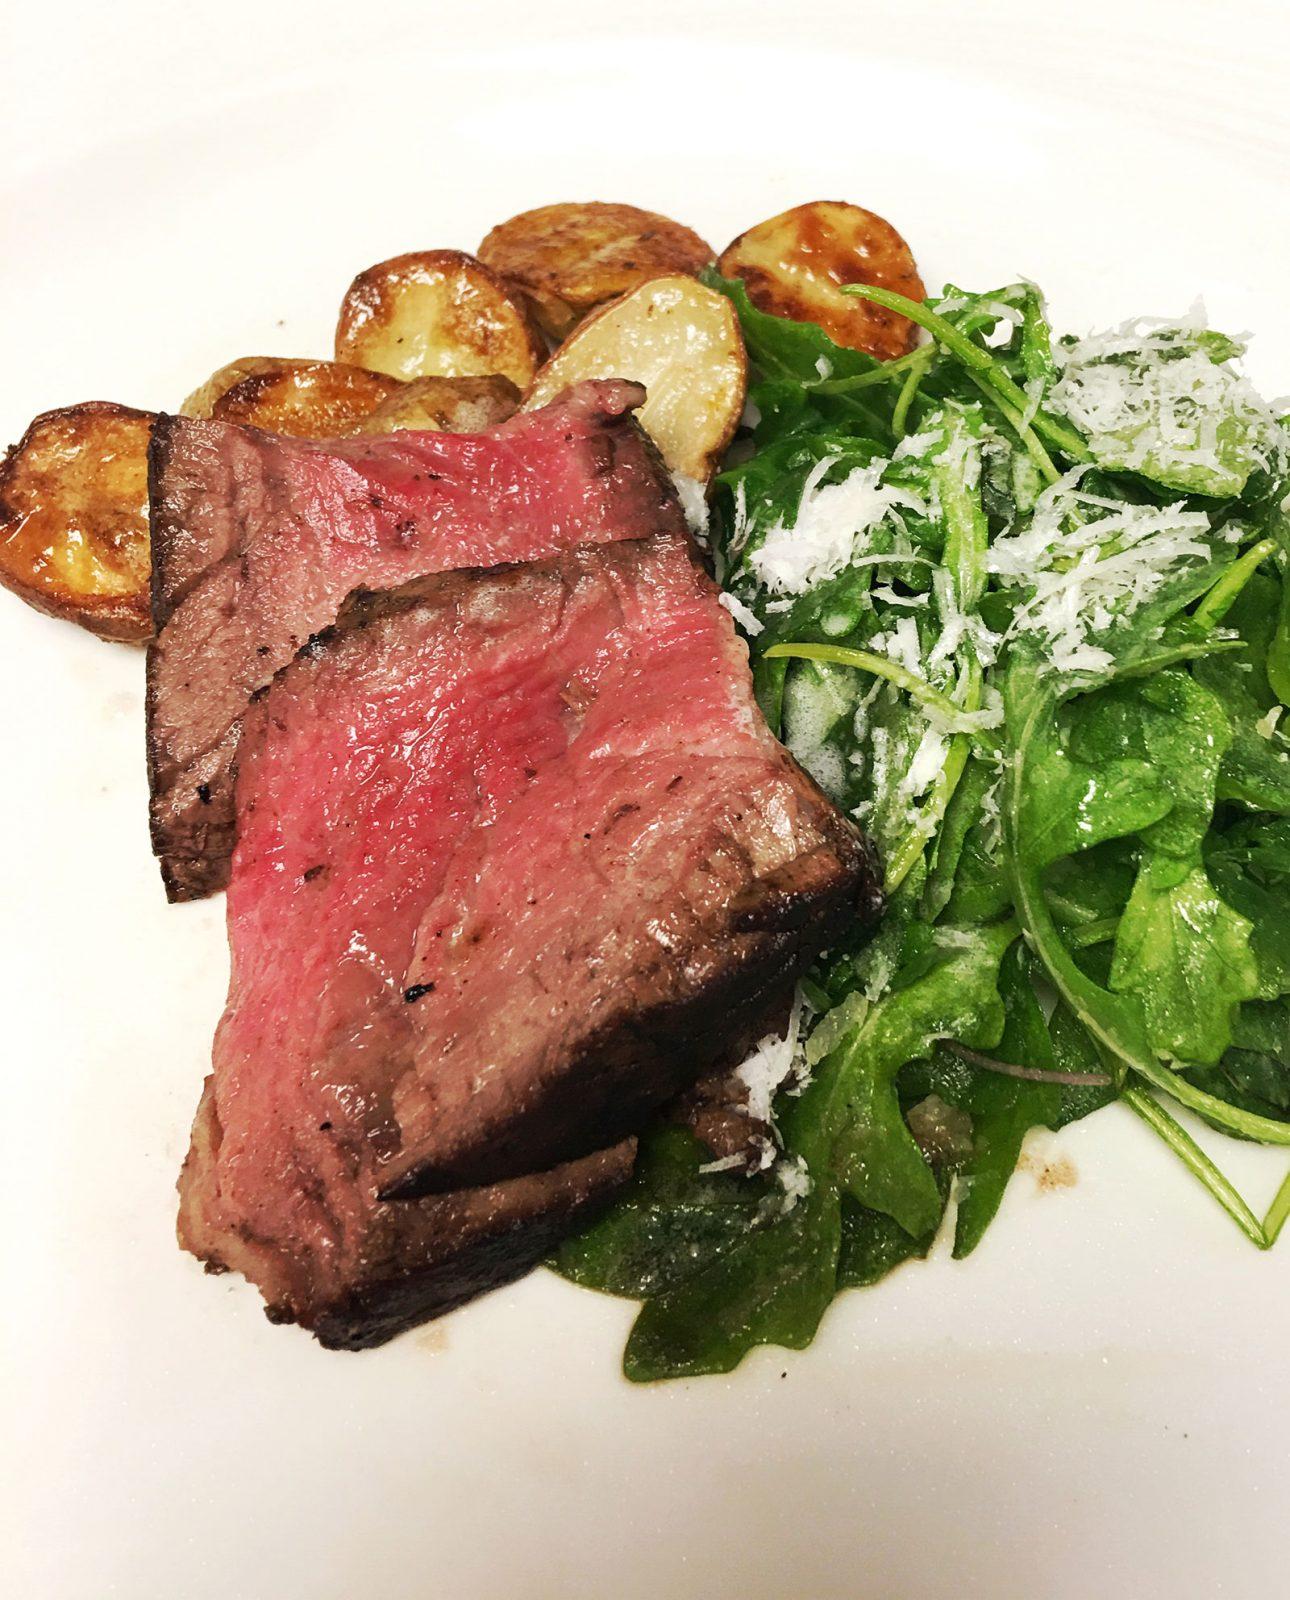 The Chophouse Steak